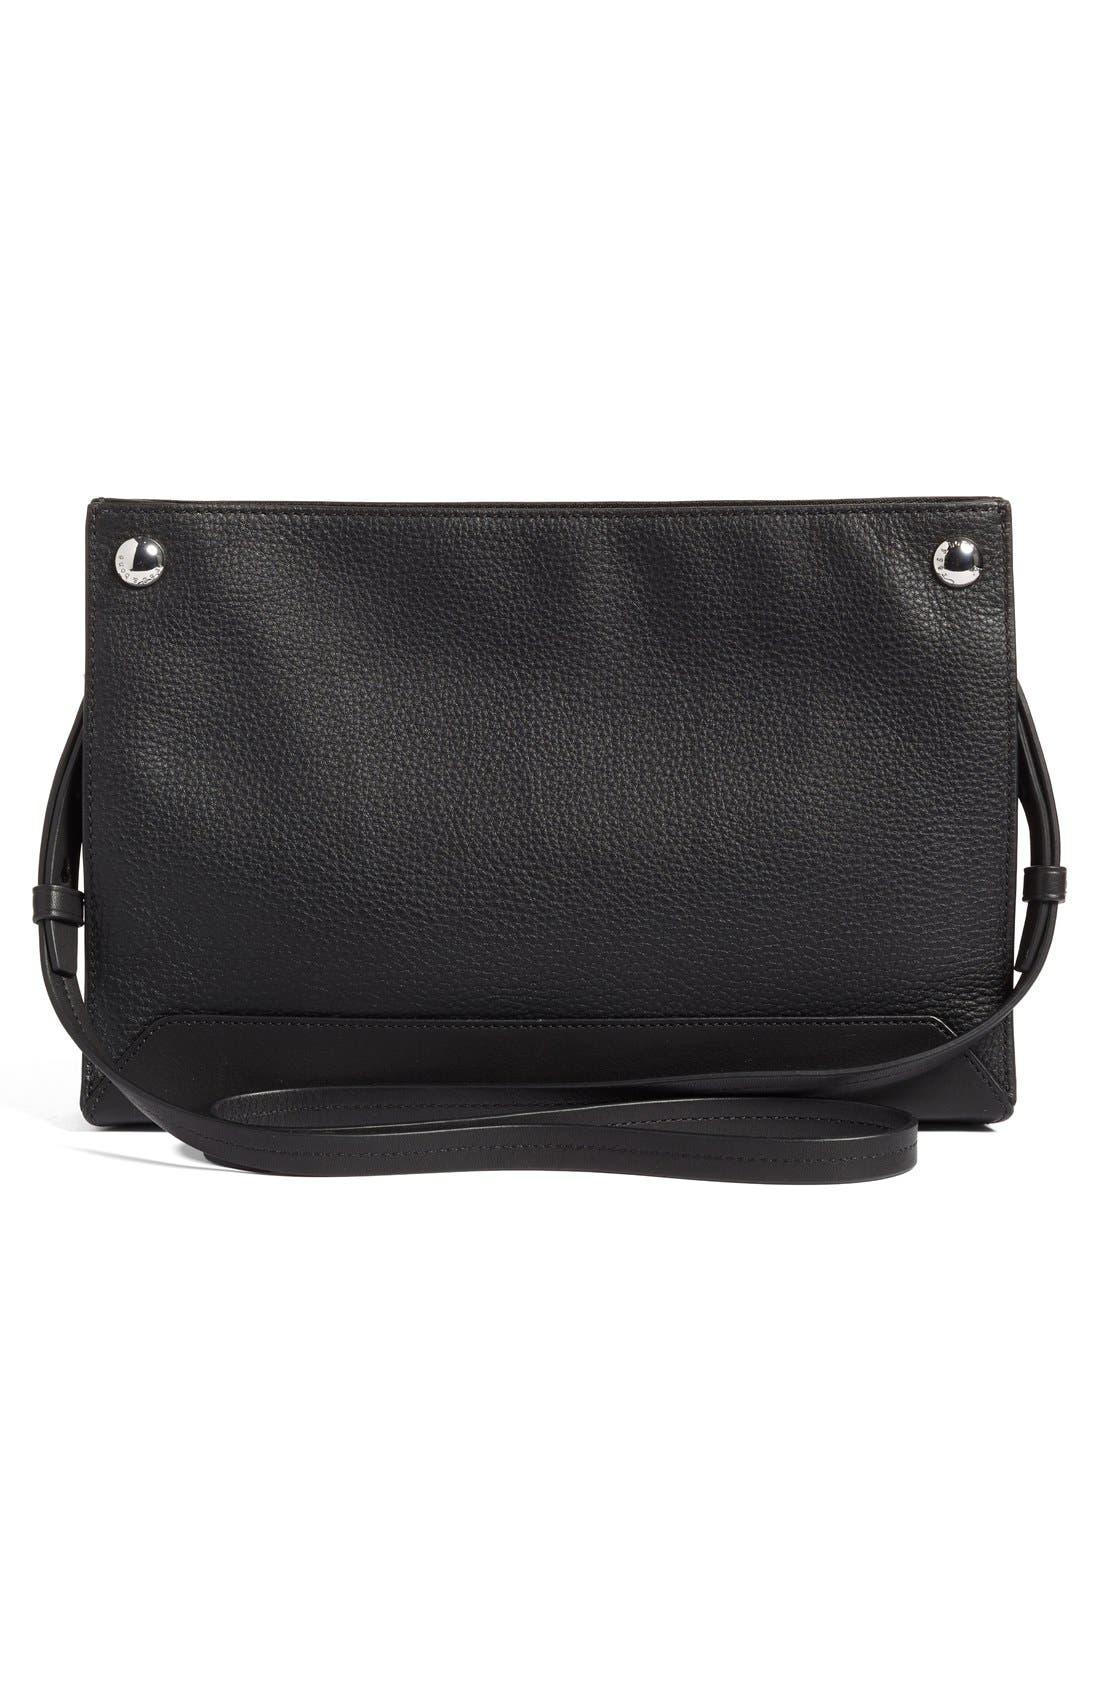 Compass Leather Crossbody Bag,                             Alternate thumbnail 4, color,                             BLACK